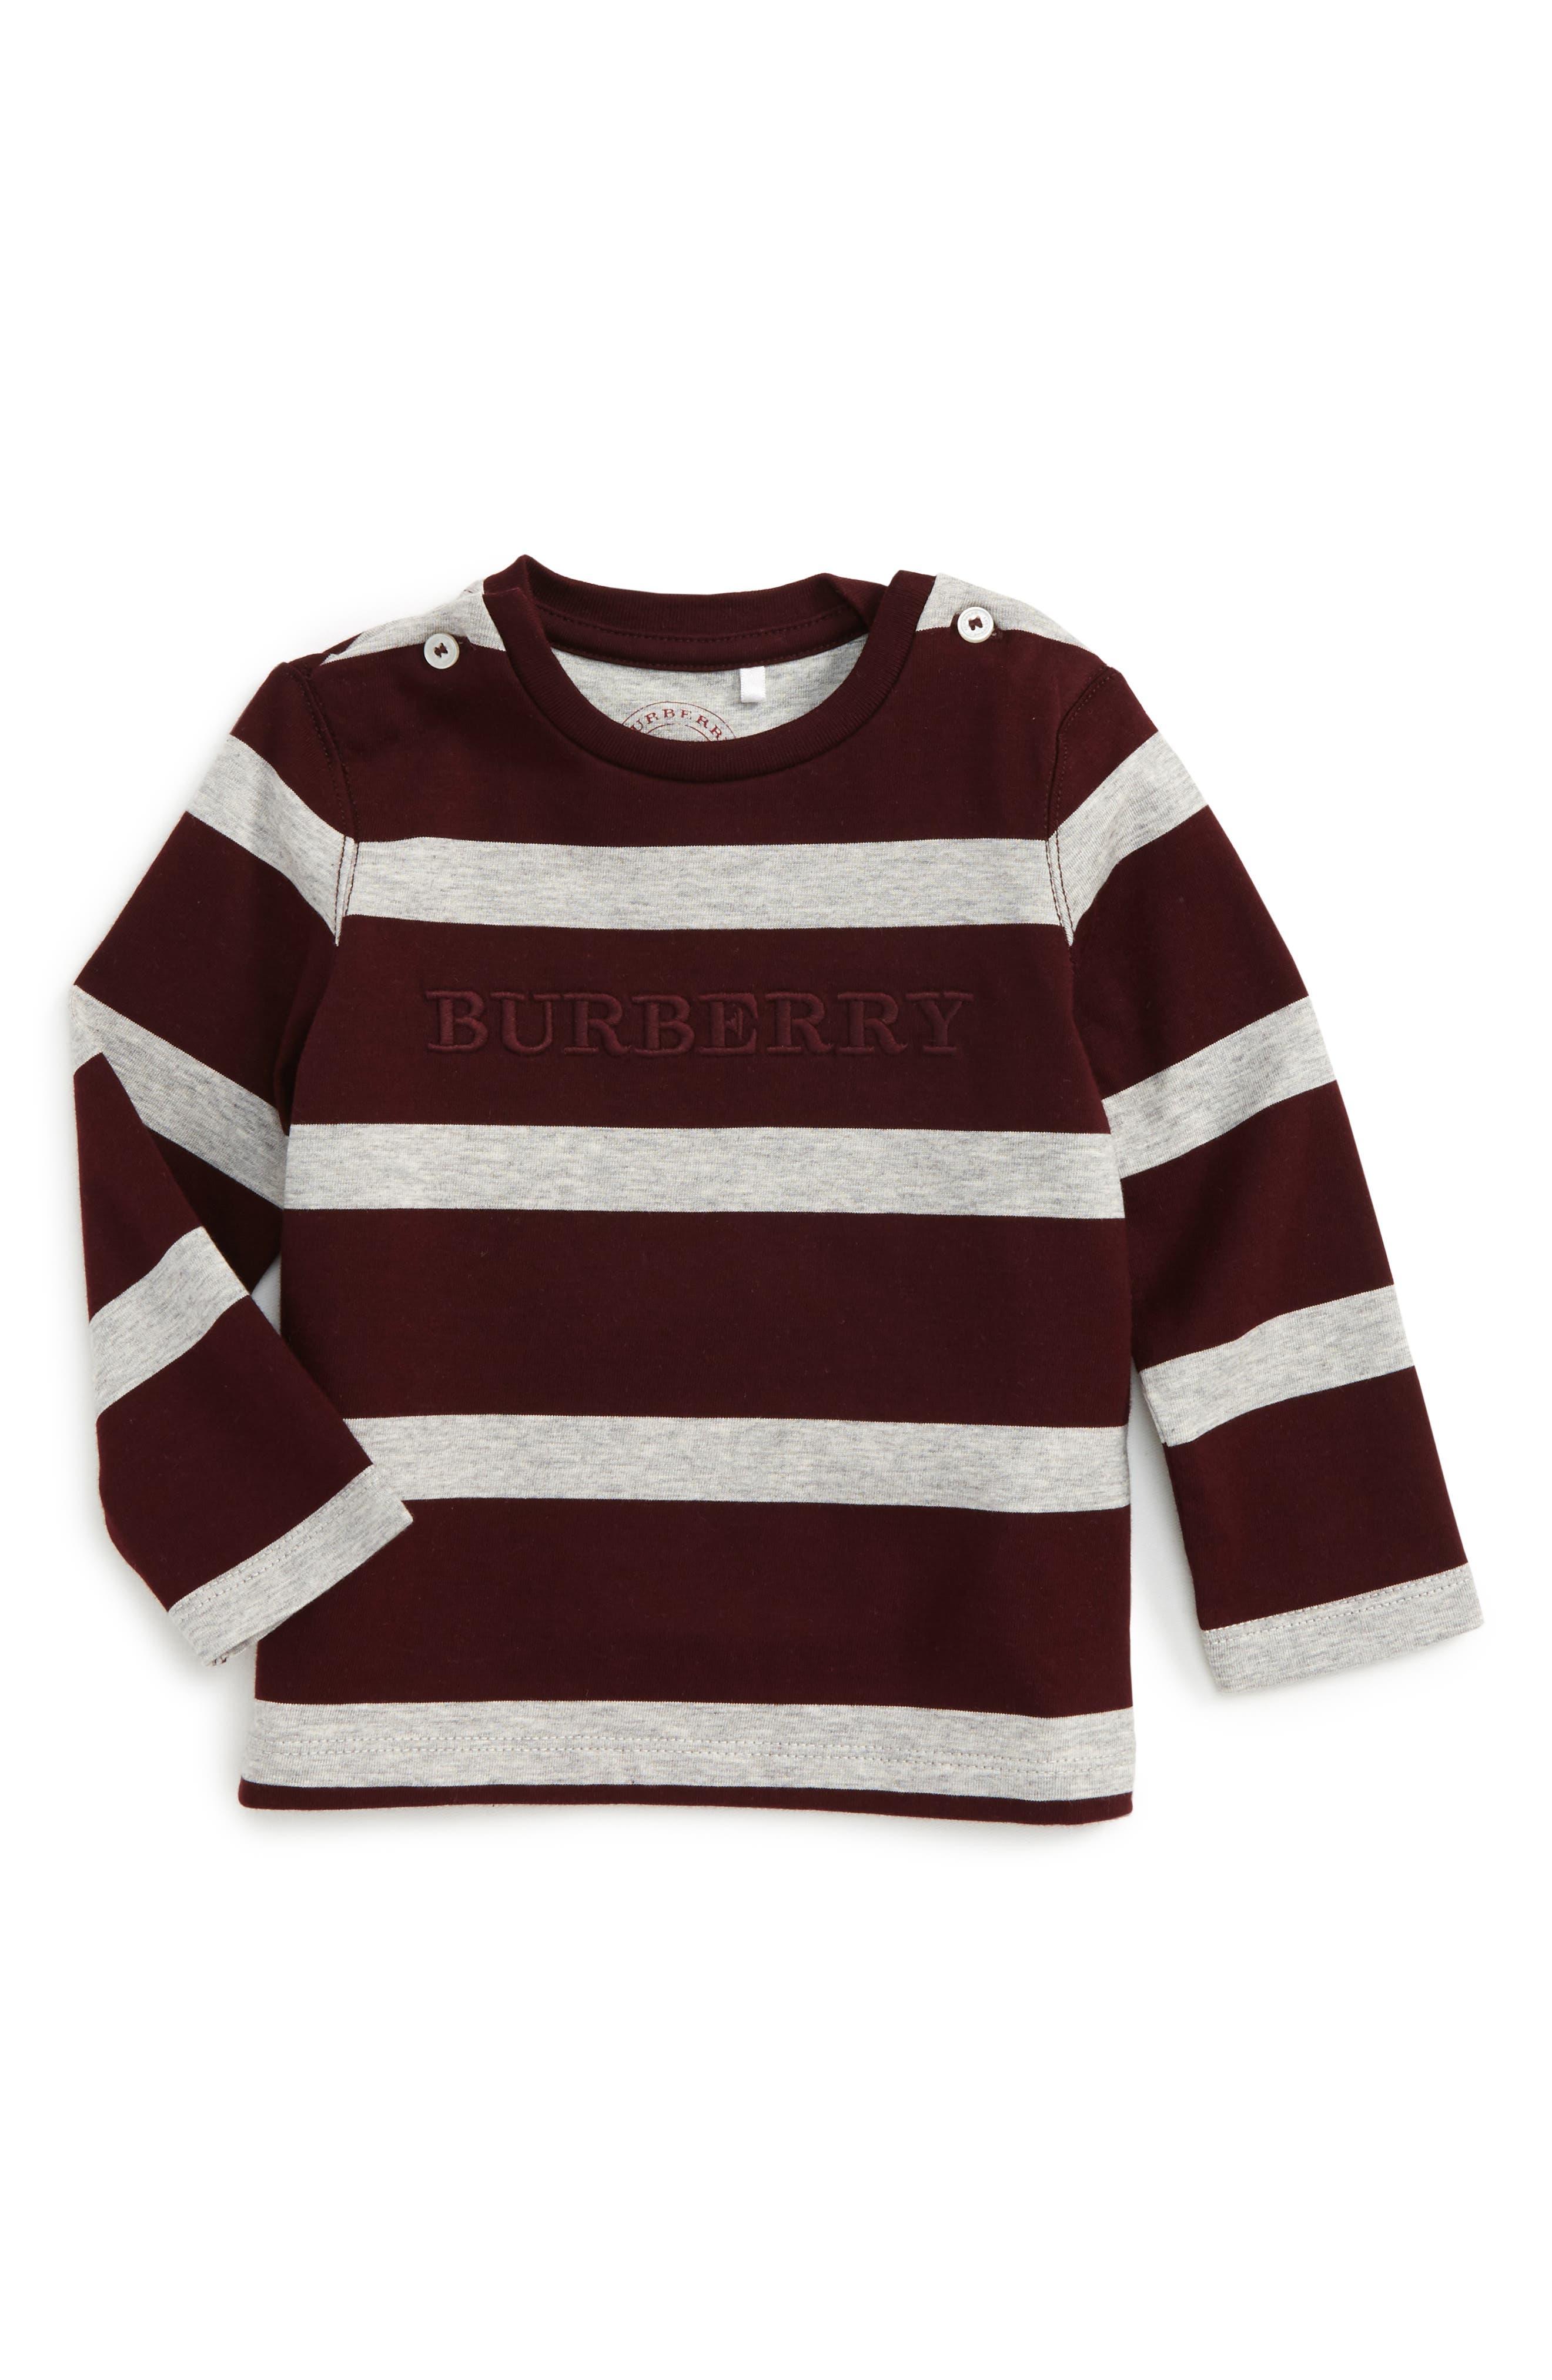 Burberry Mathew Stripe T-Shirt (Toddler Boys)